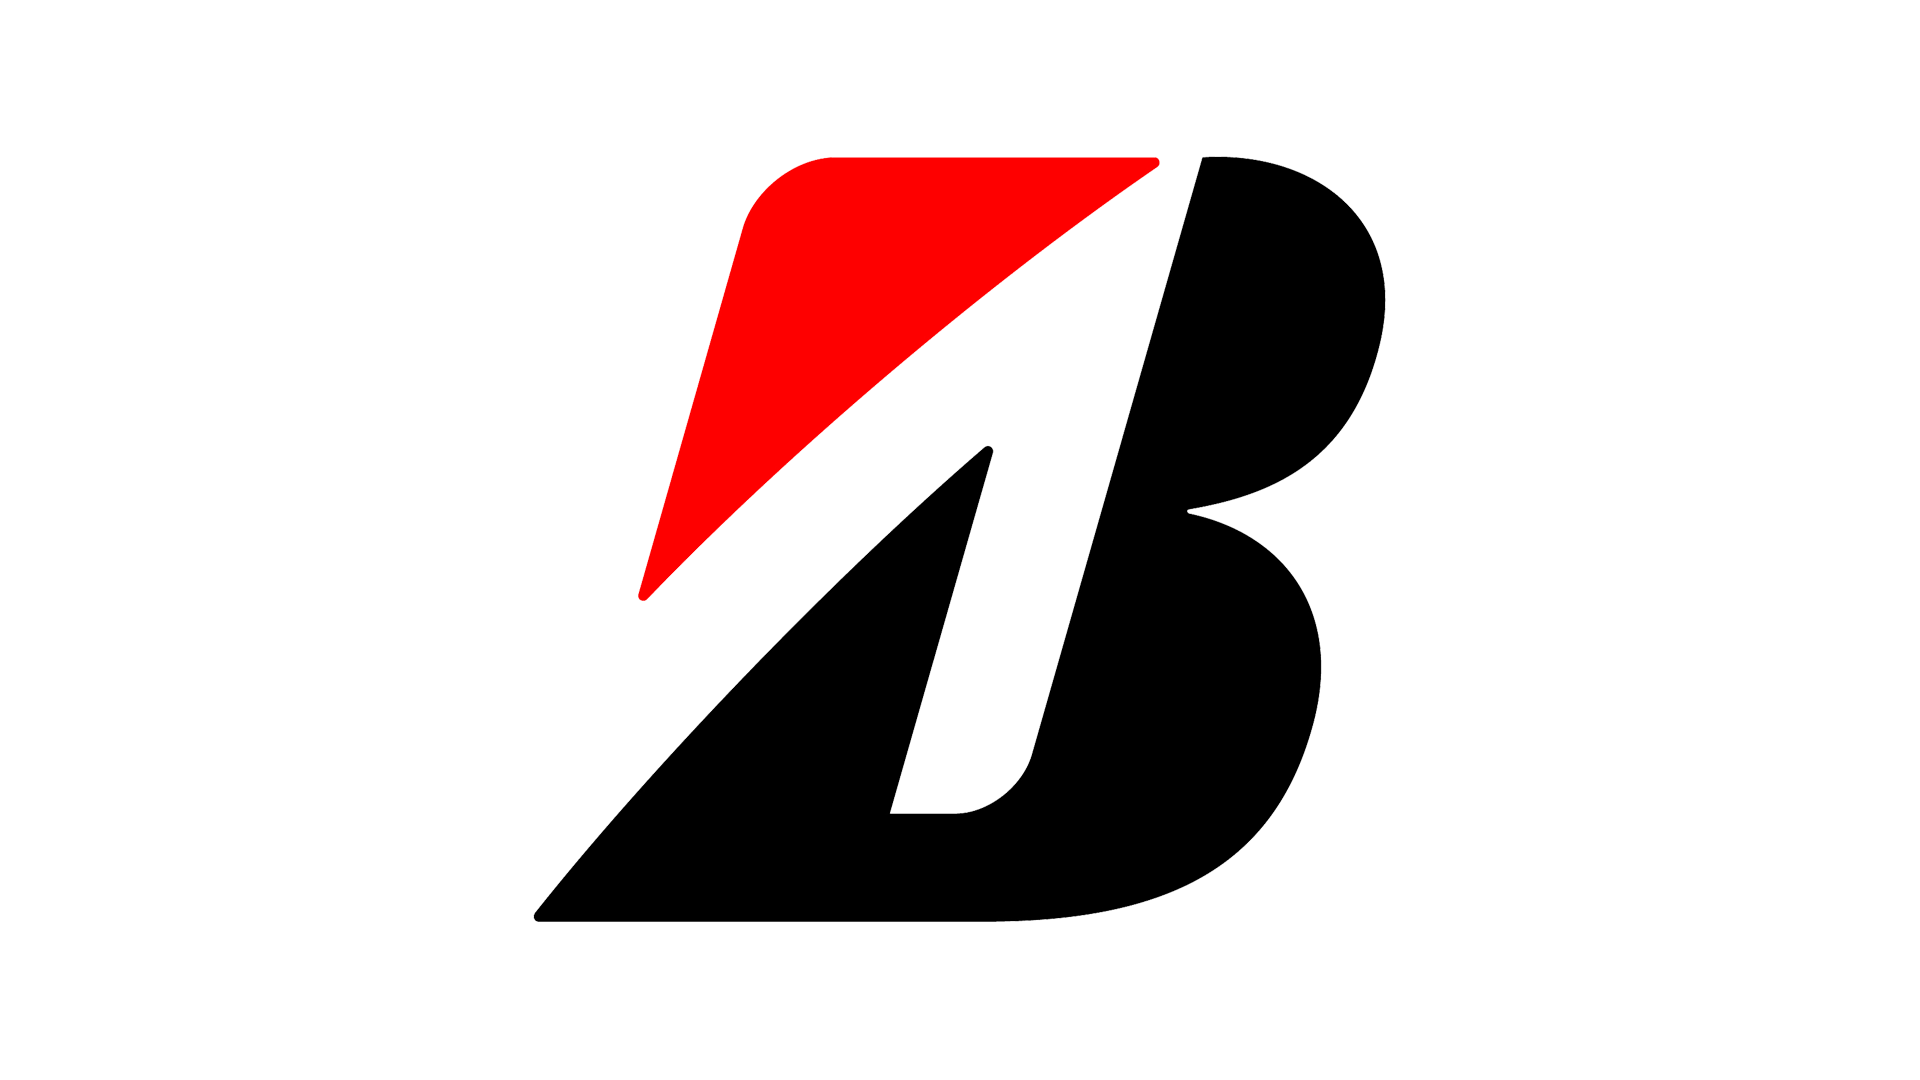 bridgestone logo hd png information carlogos org rh carlogos org hd logistics inc hd logos download